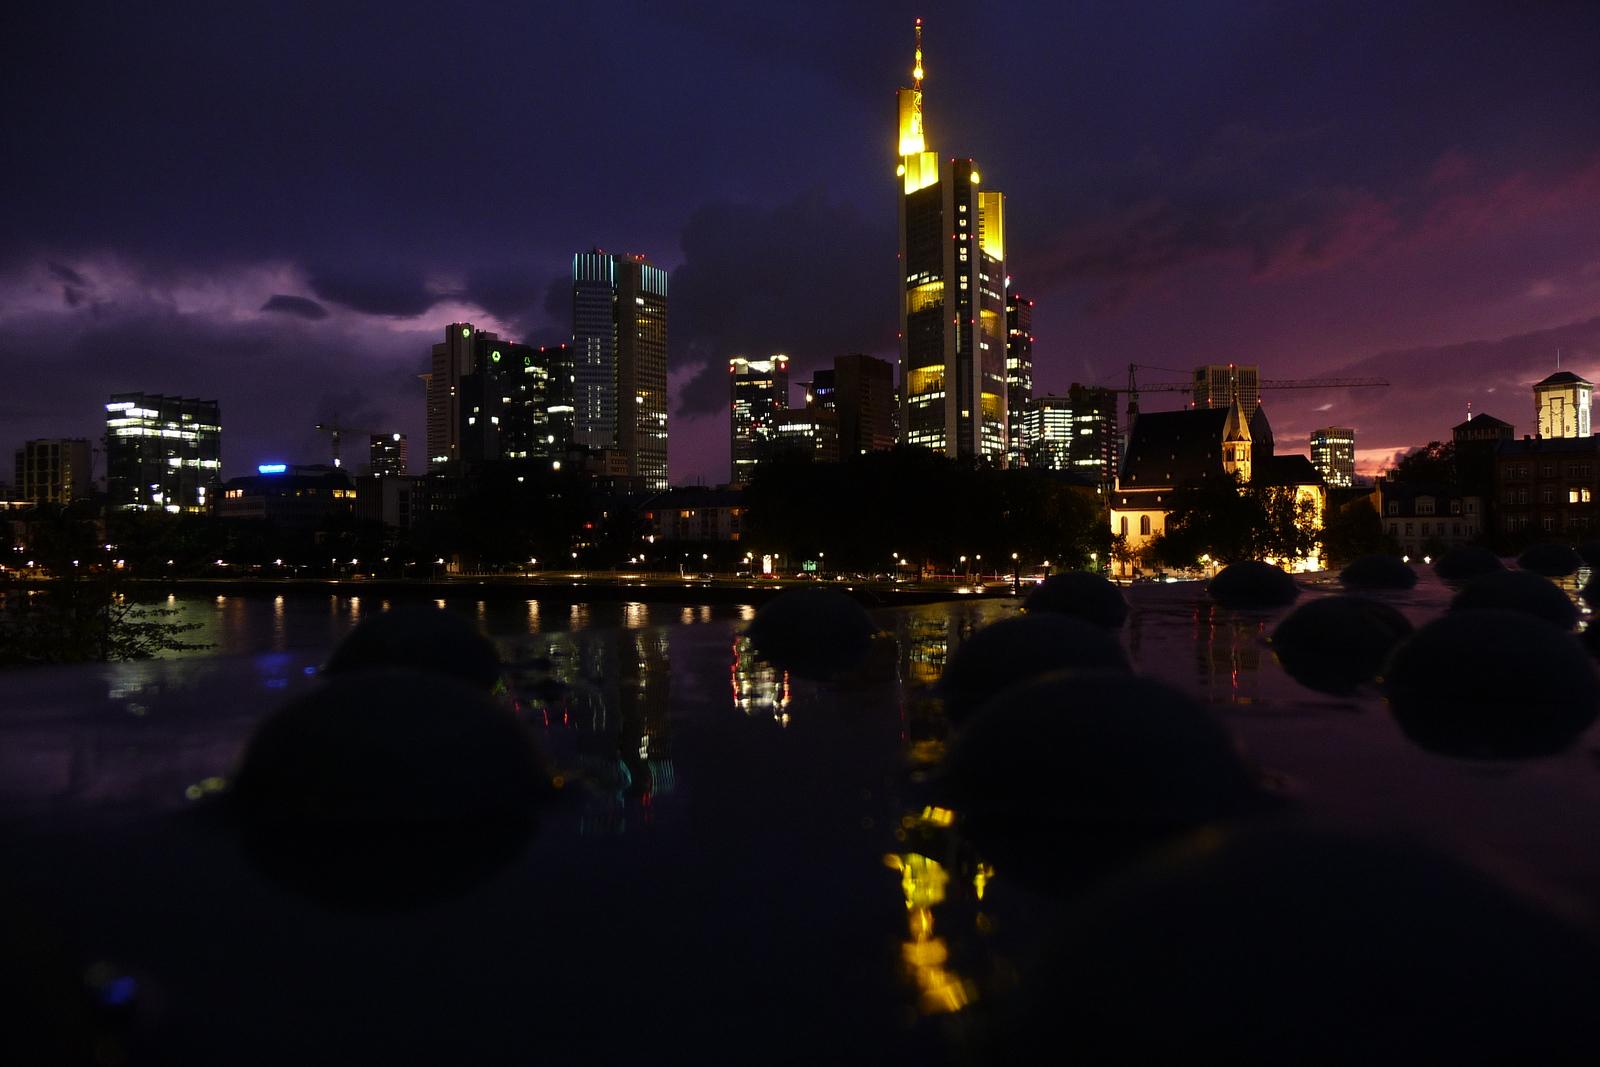 Frankfurt skyline from the Eisener Steg (Iron footbridge)